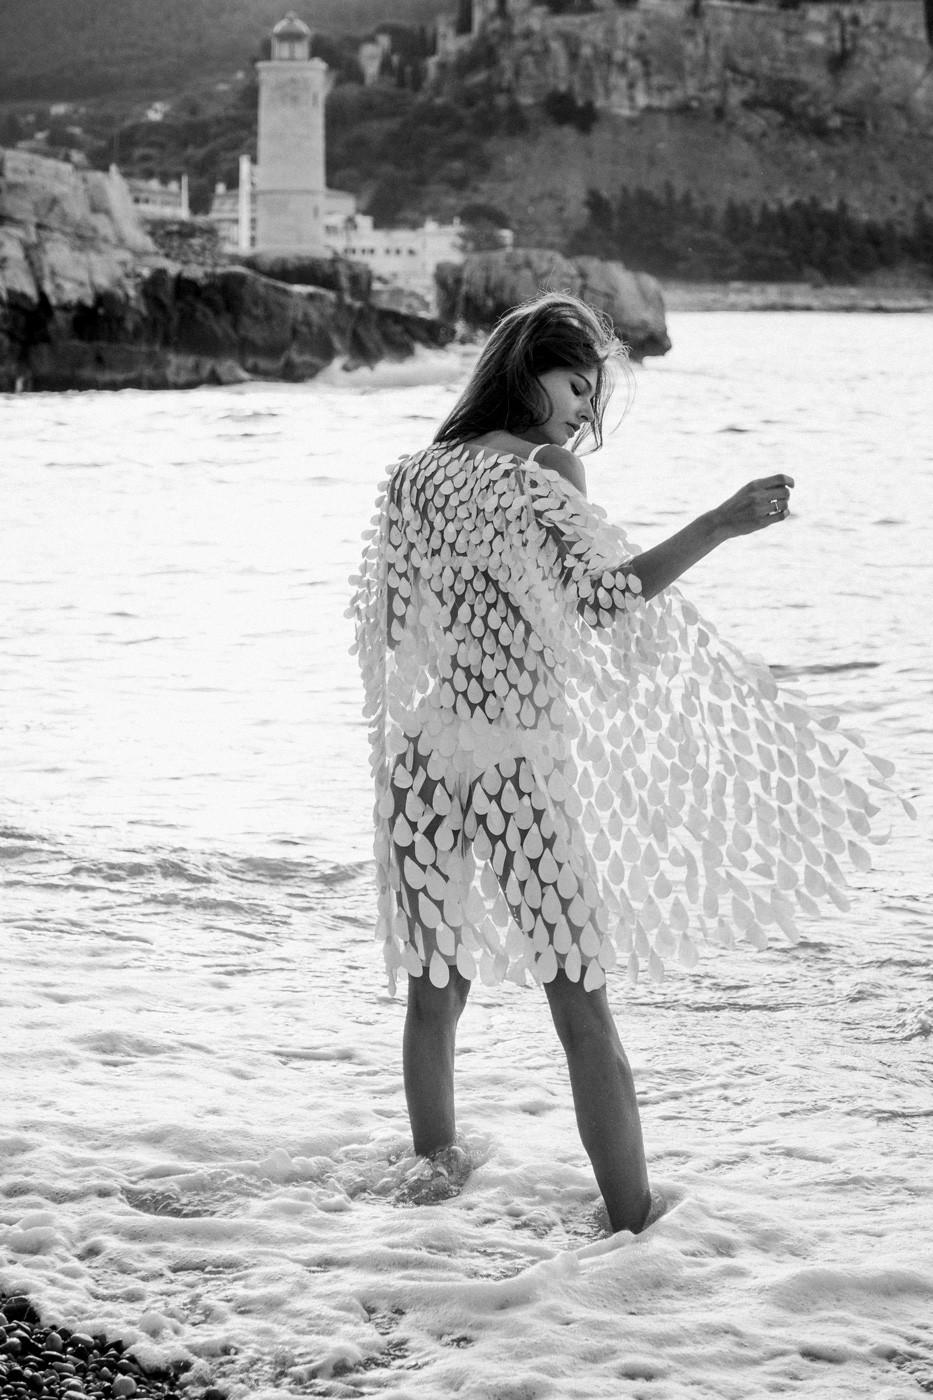 ELISA_NESS_Collection_2020_Oceane_01